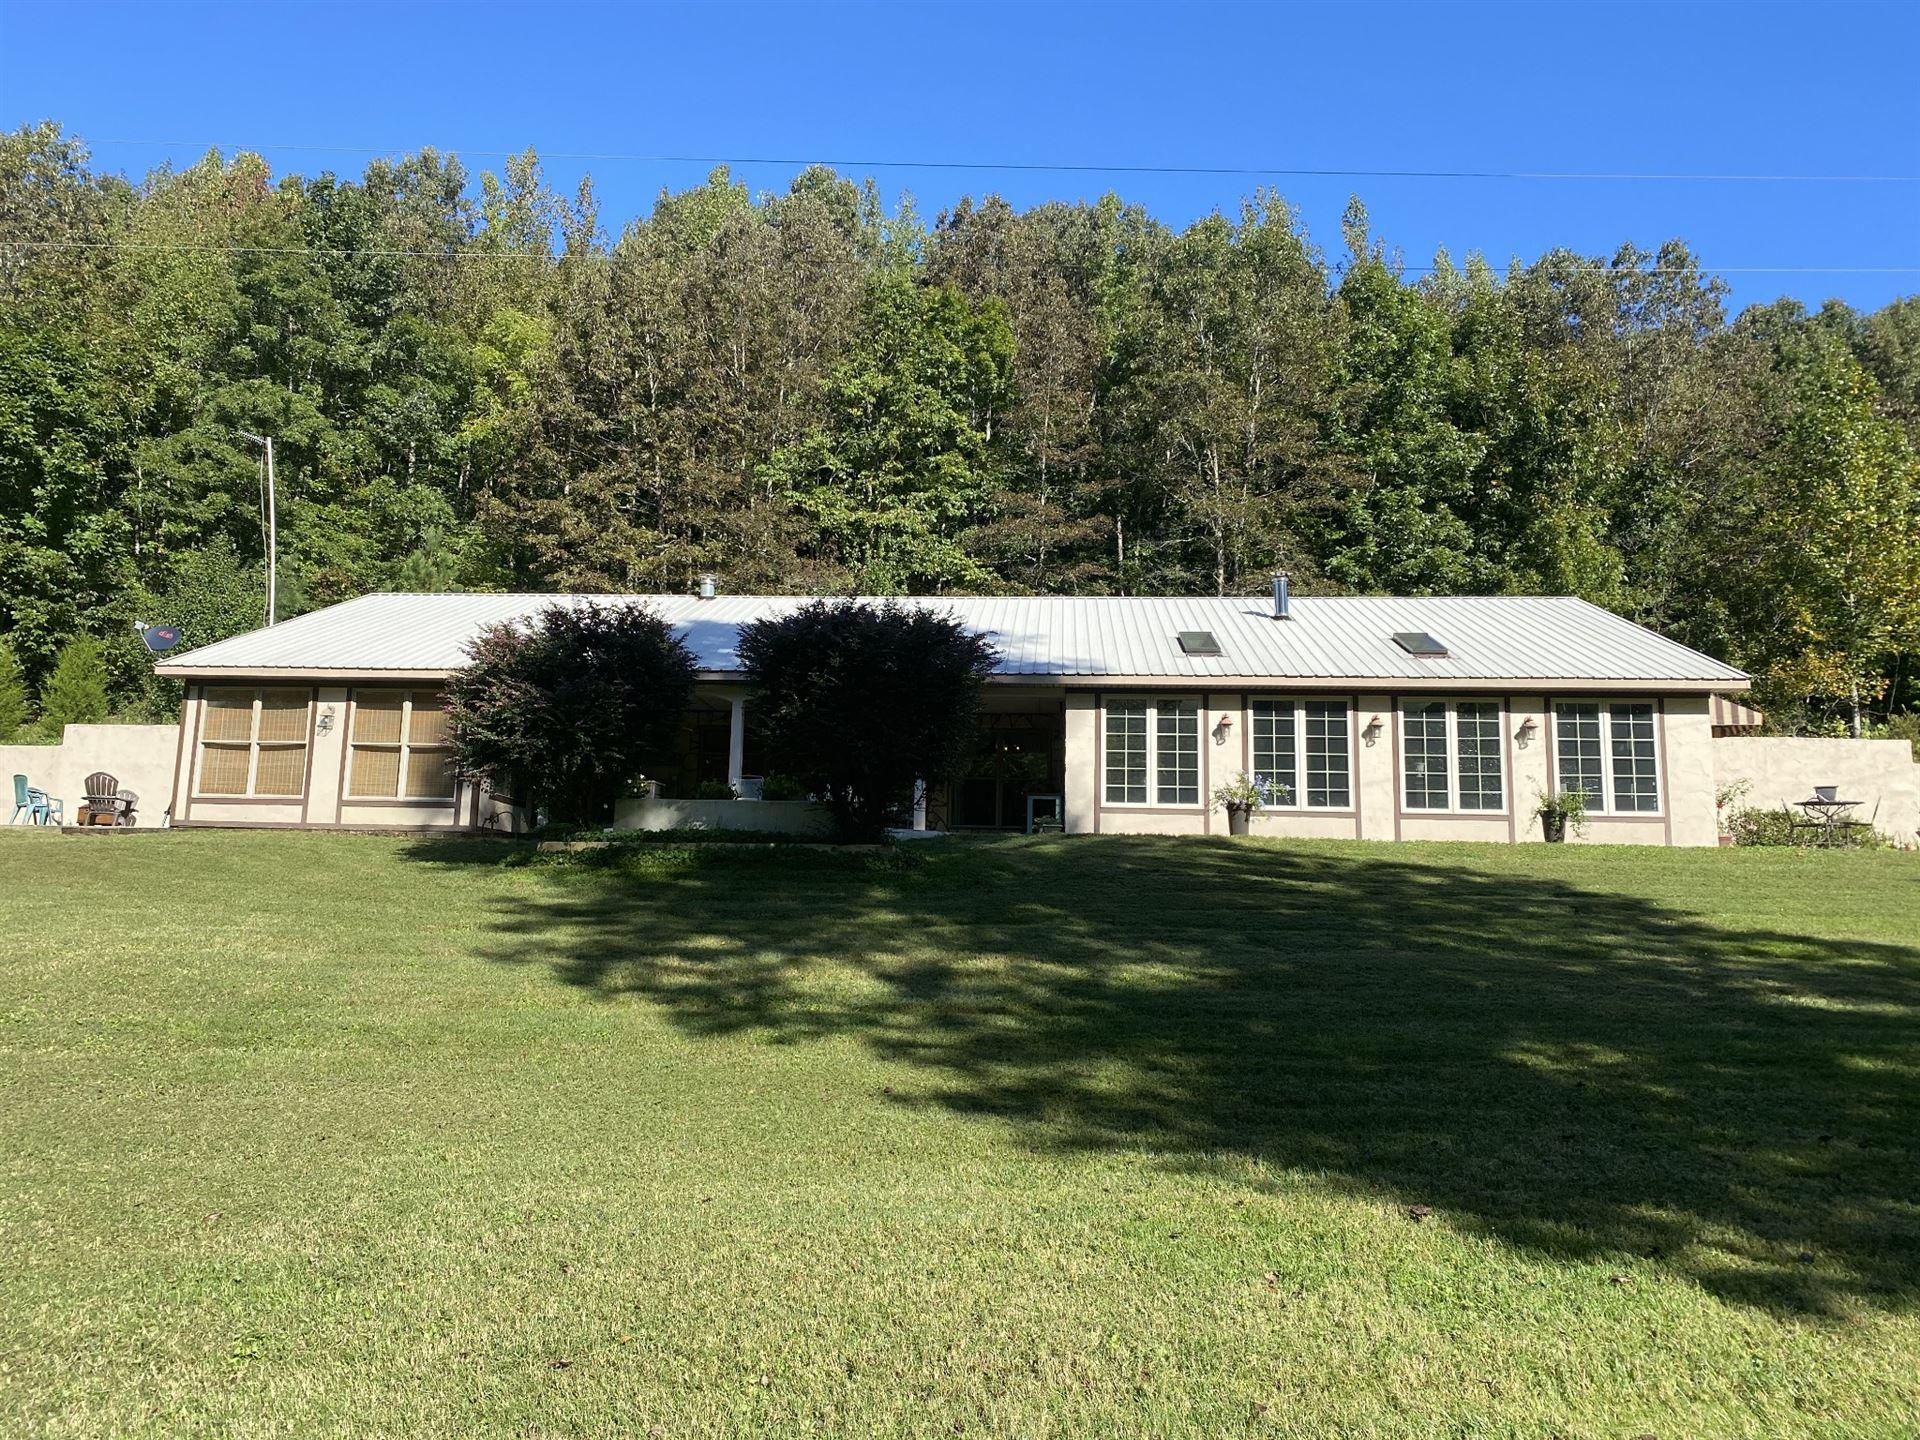 Photo of 198 Moore Rd, Iron City, TN 38463 (MLS # 2192245)